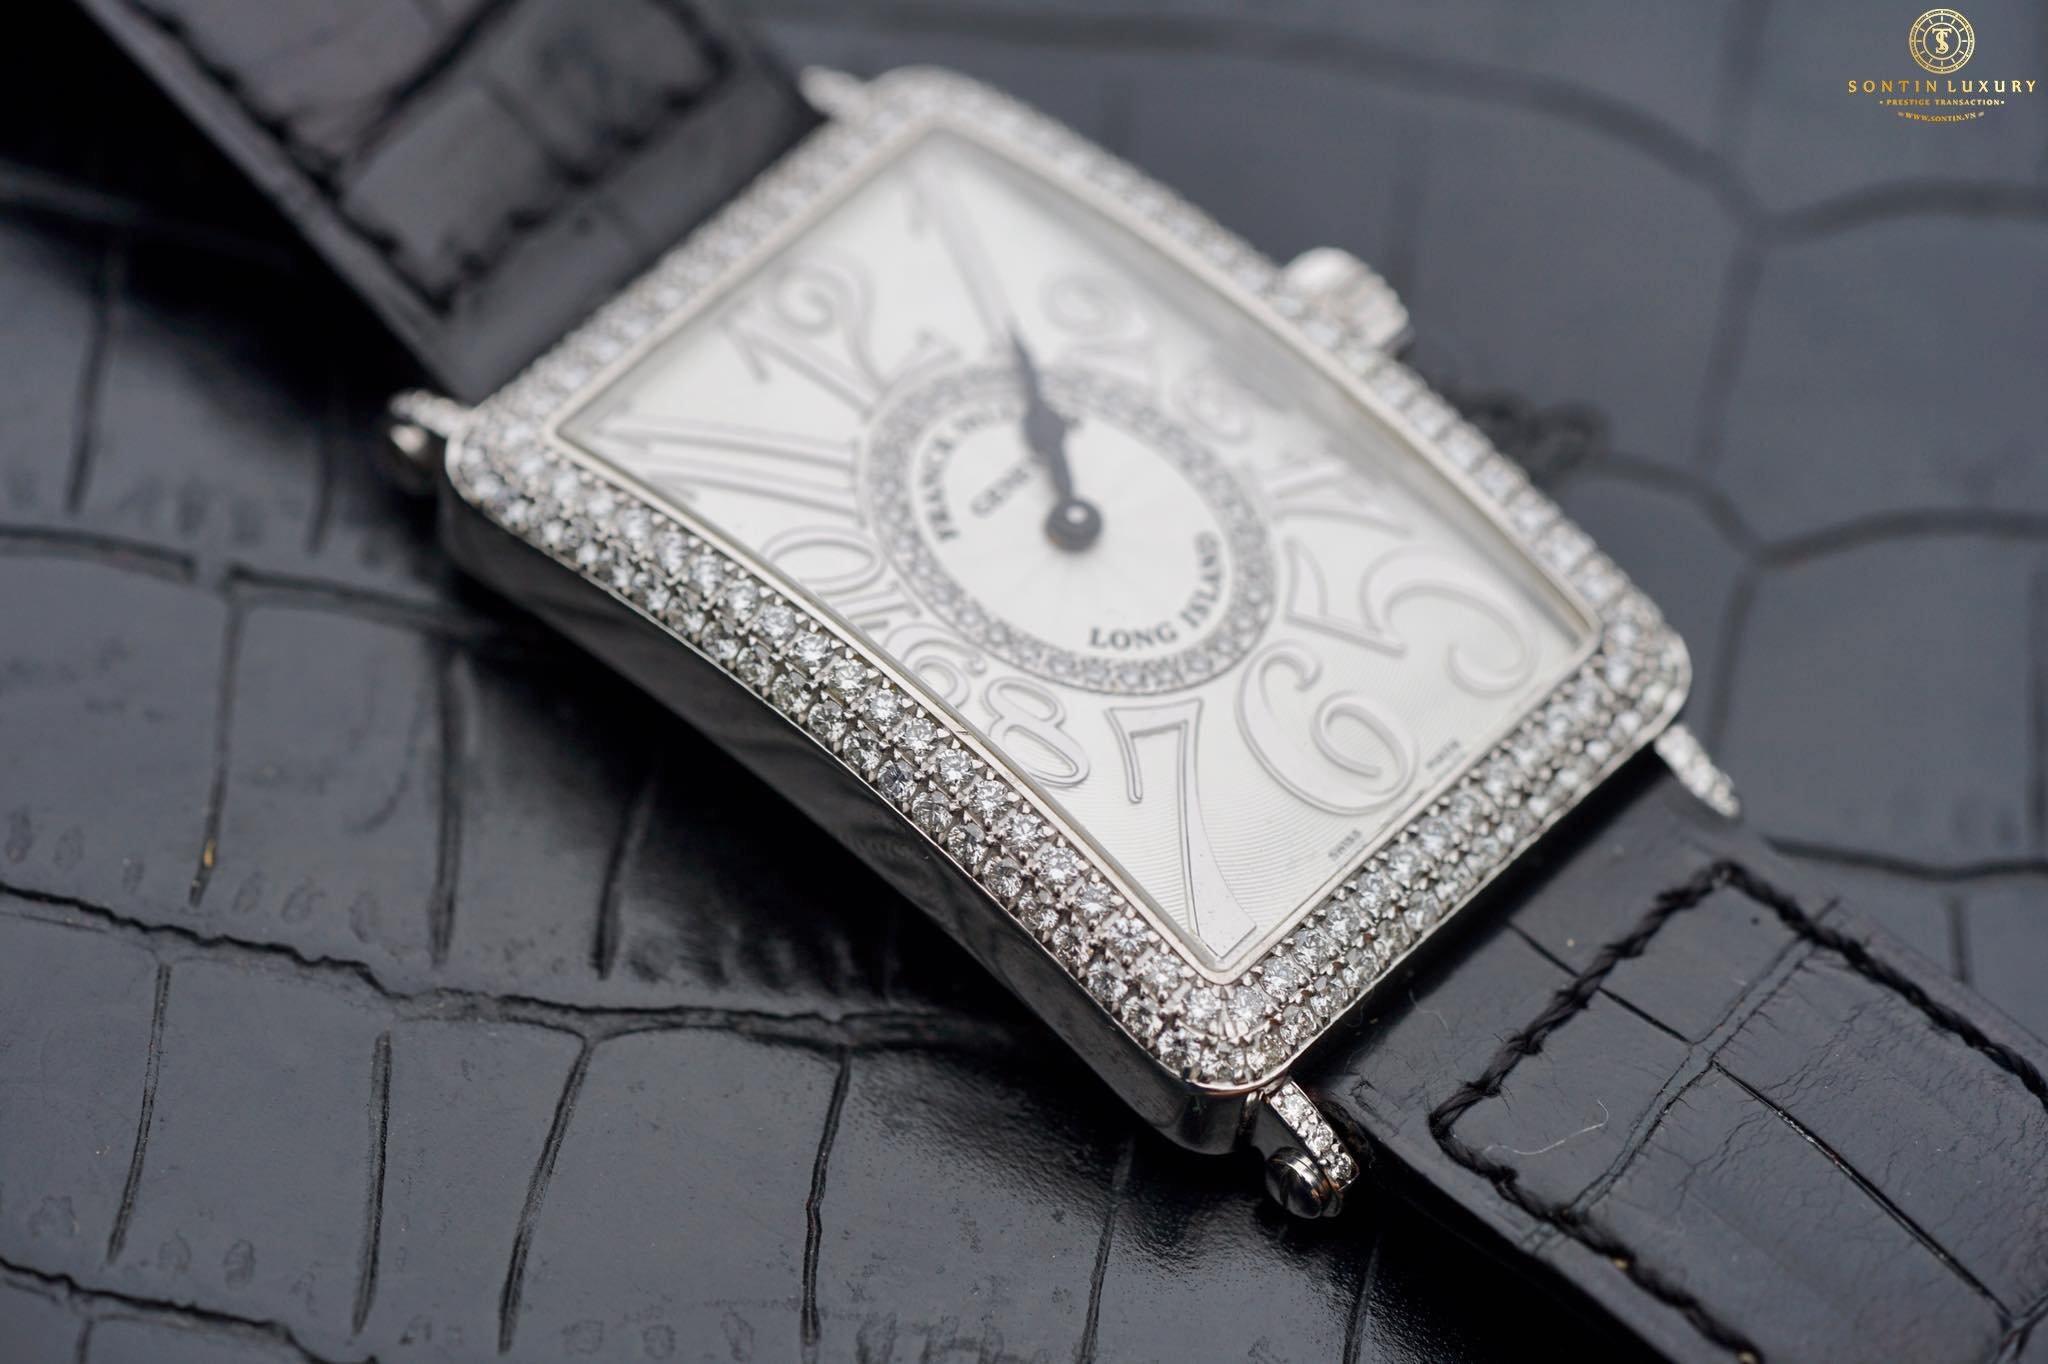 Franck Muller Long Island 1000Qz D CD 1R White Gold Original Diamond